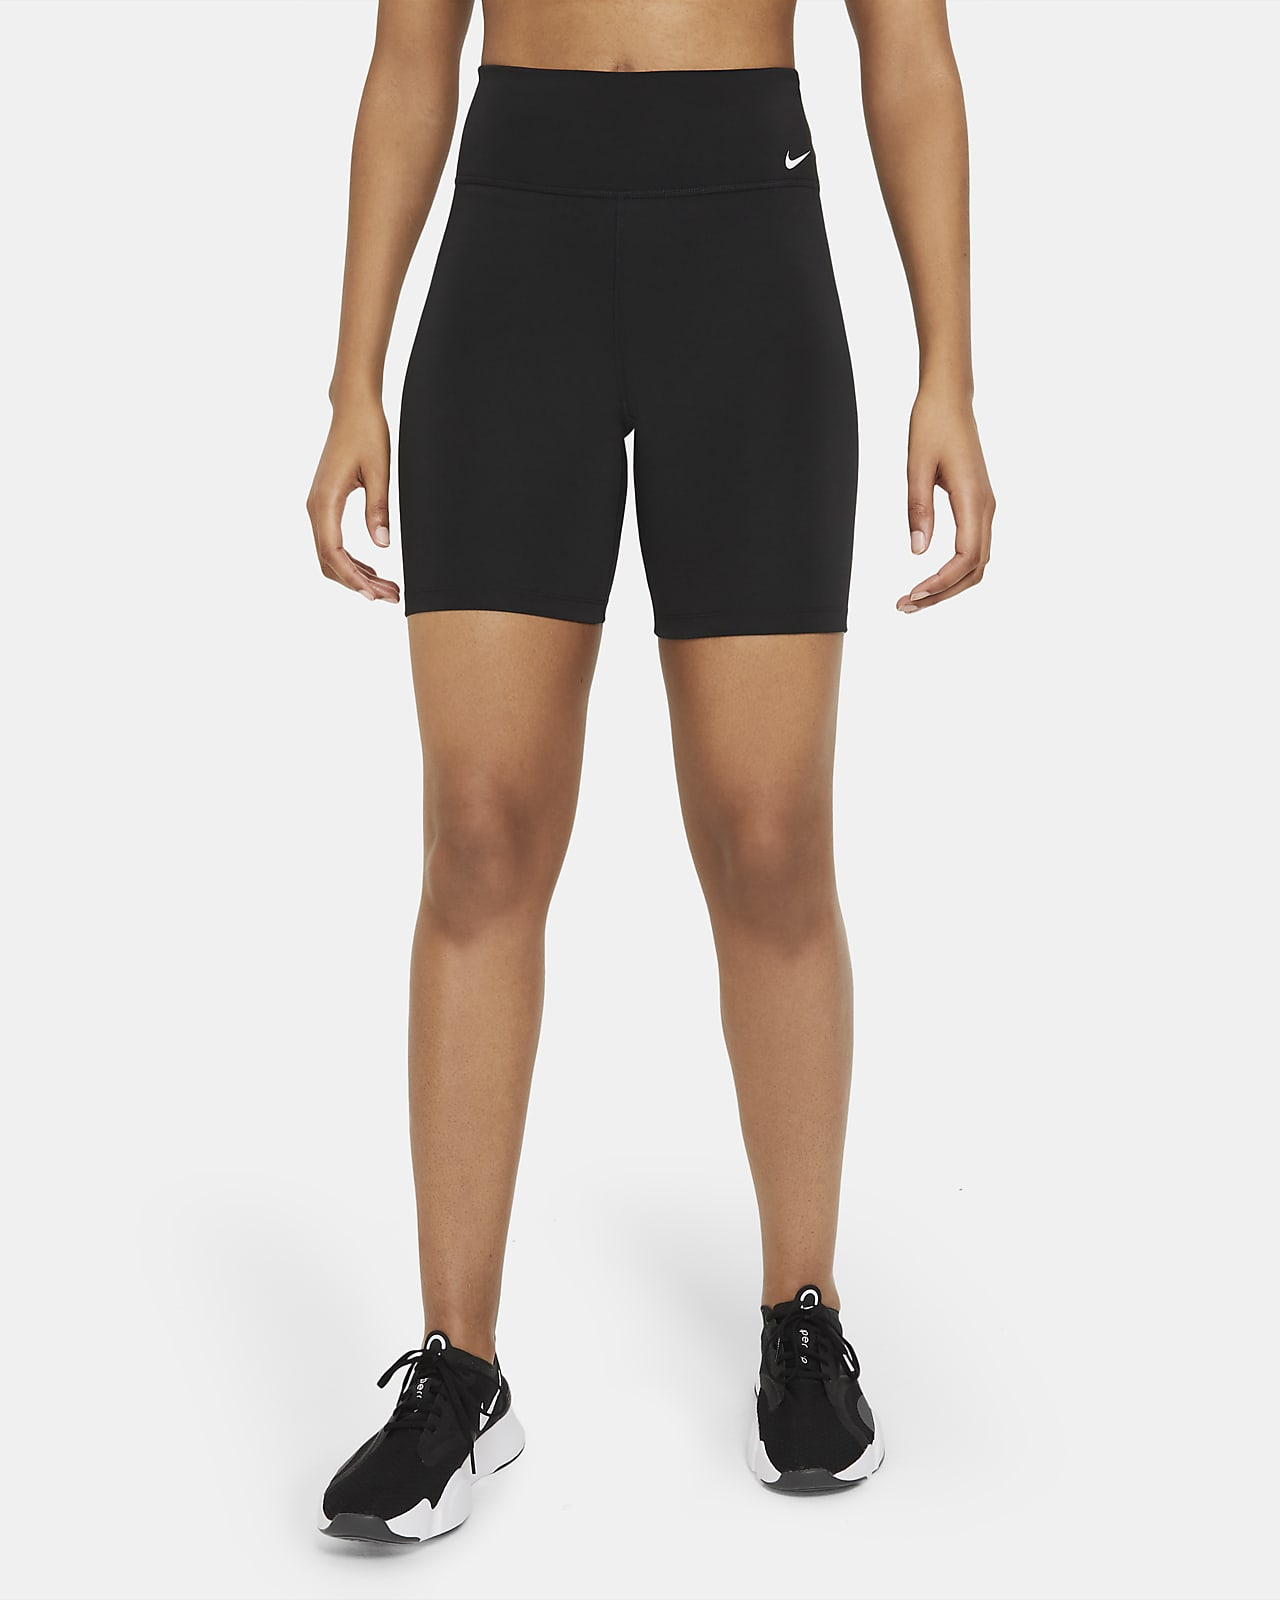 Nike One Women's Mid-Rise 18cm (approx.) Bike Shorts